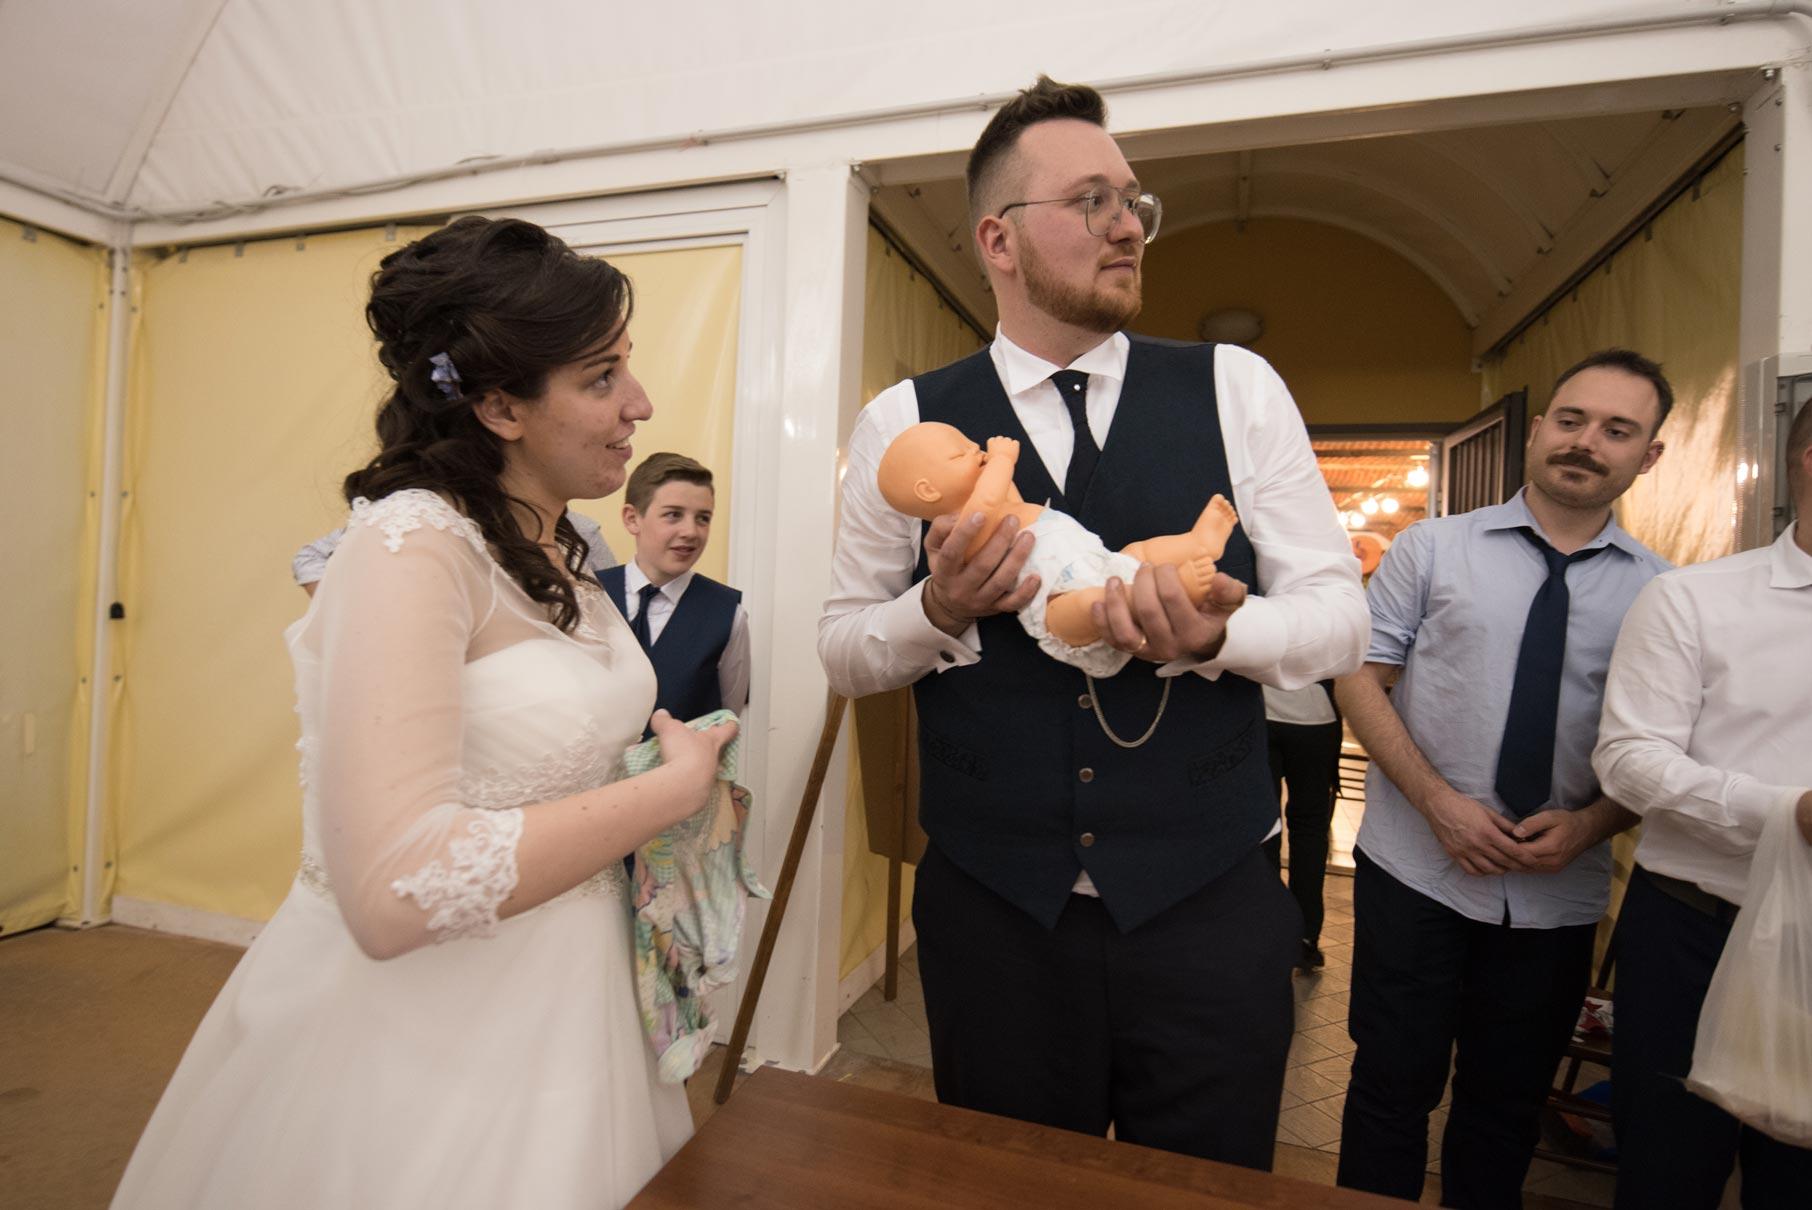 Matrimonio a Narzole Lorenza Diego - DSC 0883 - Fotografo matrimonio scherzi matrimonio - Fotografo matrimonio scherzi matrimonio